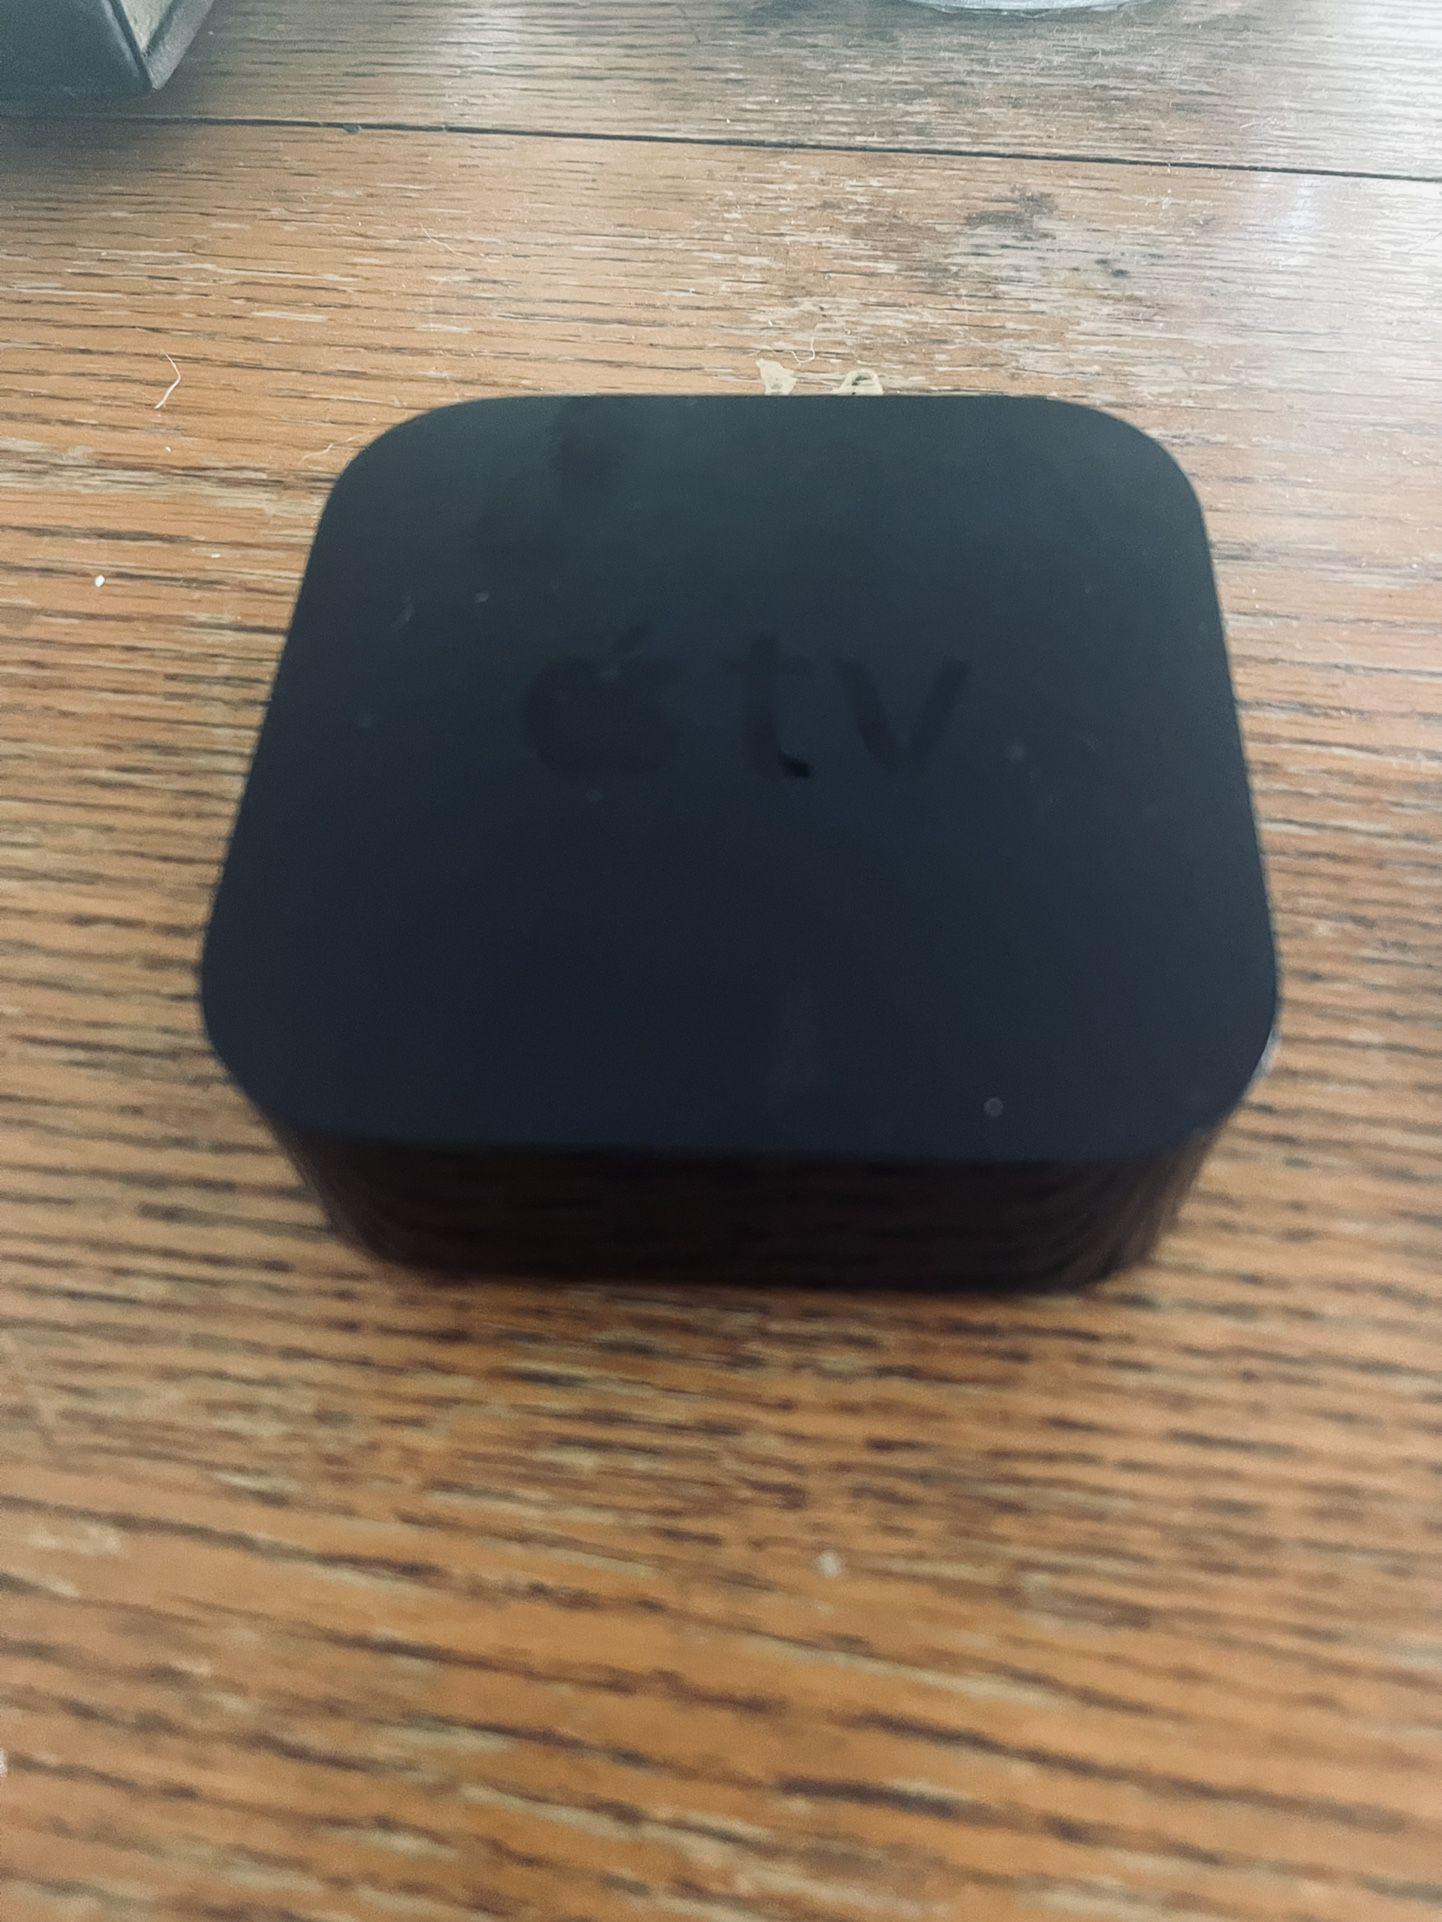 Apple TV (2) 32gb